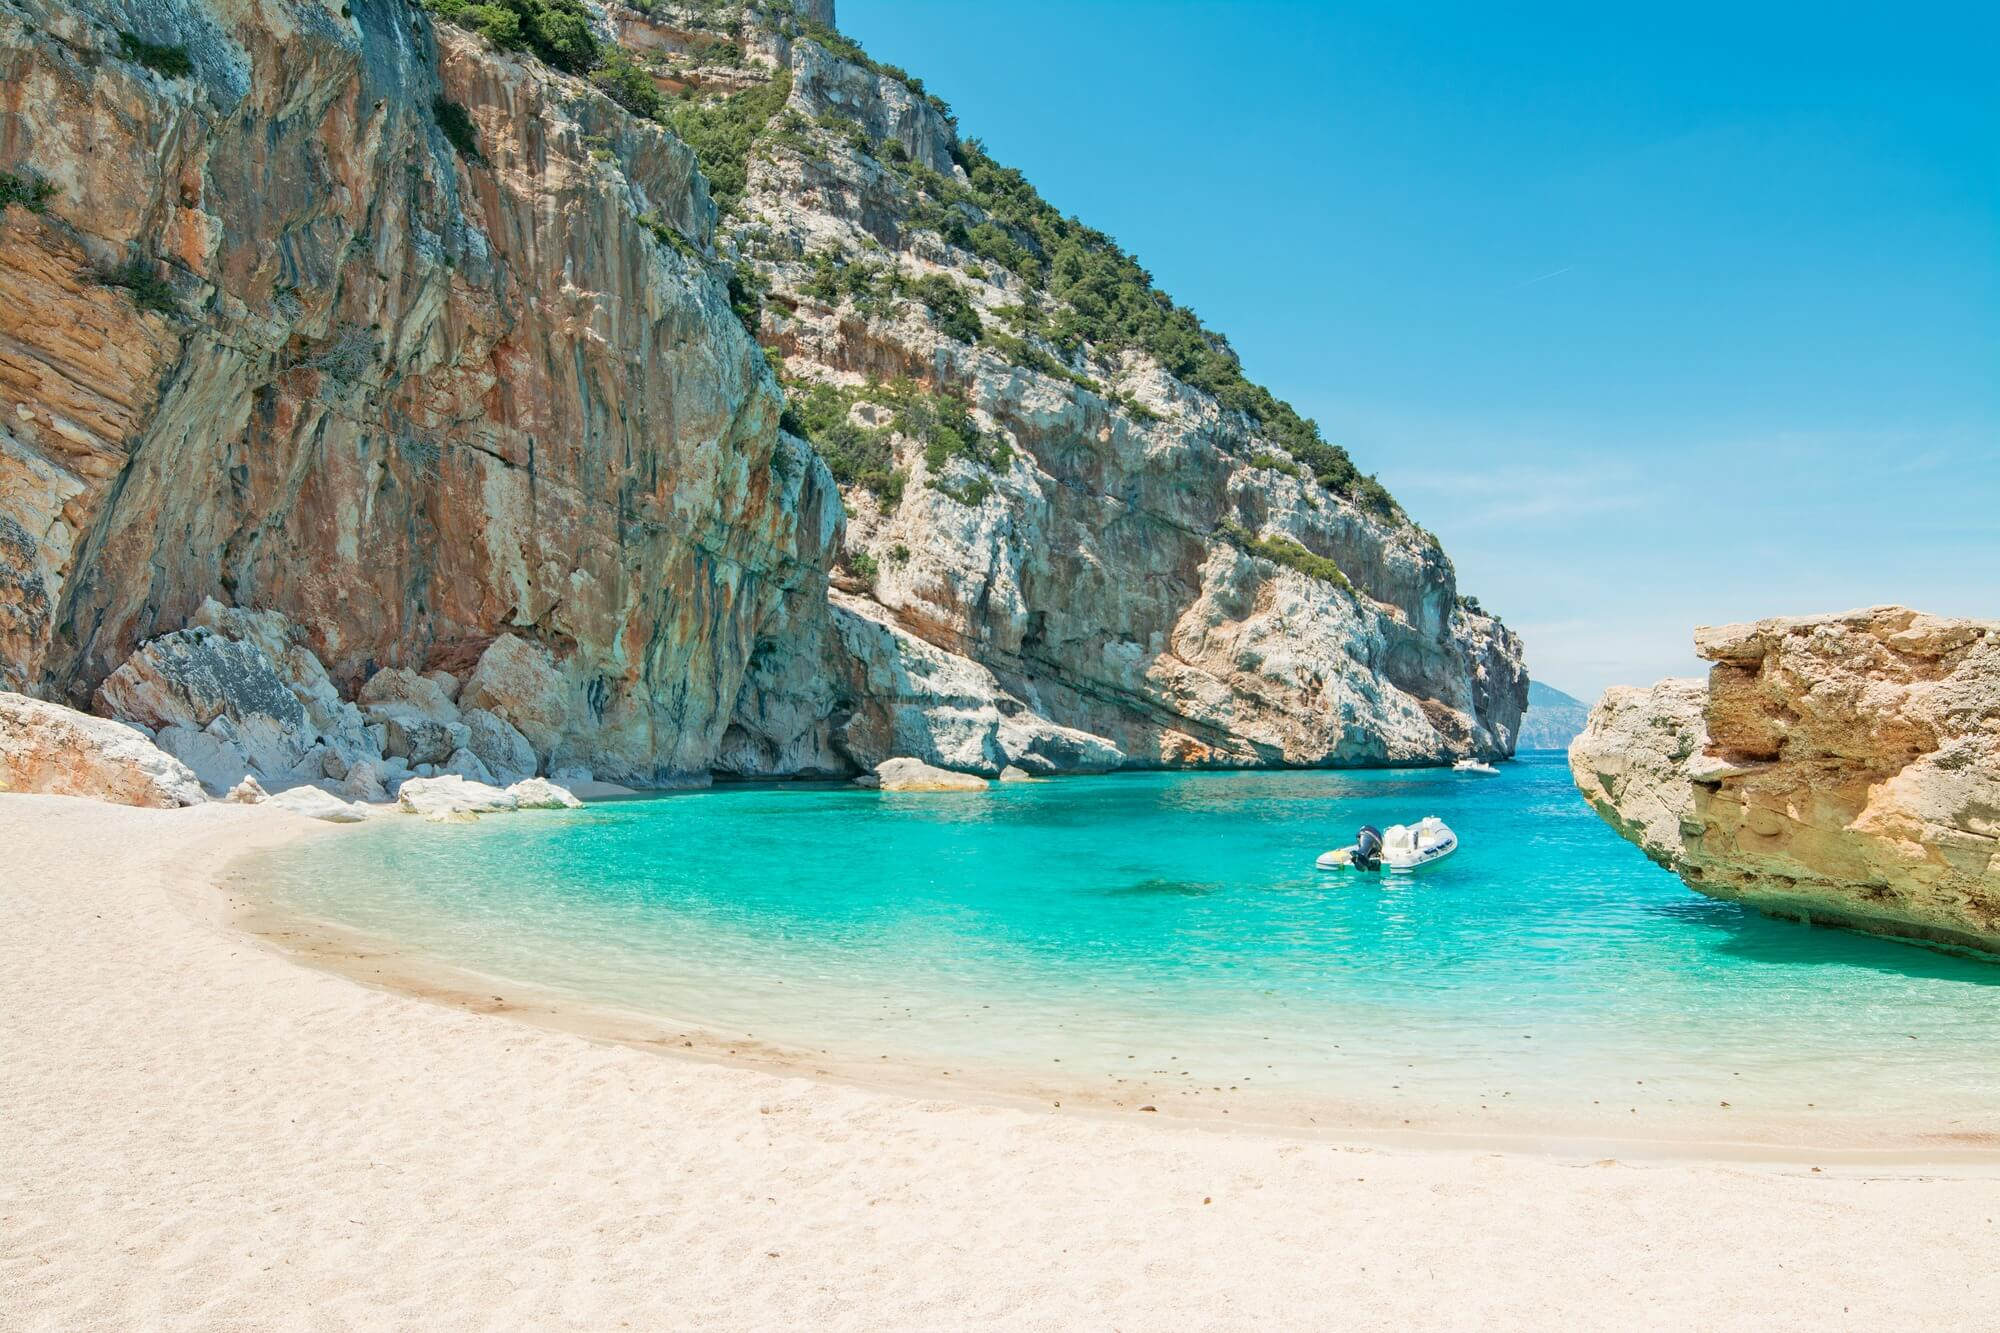 Cala Mariolu, altra meraviglia del tour targato Flamar Vacanze